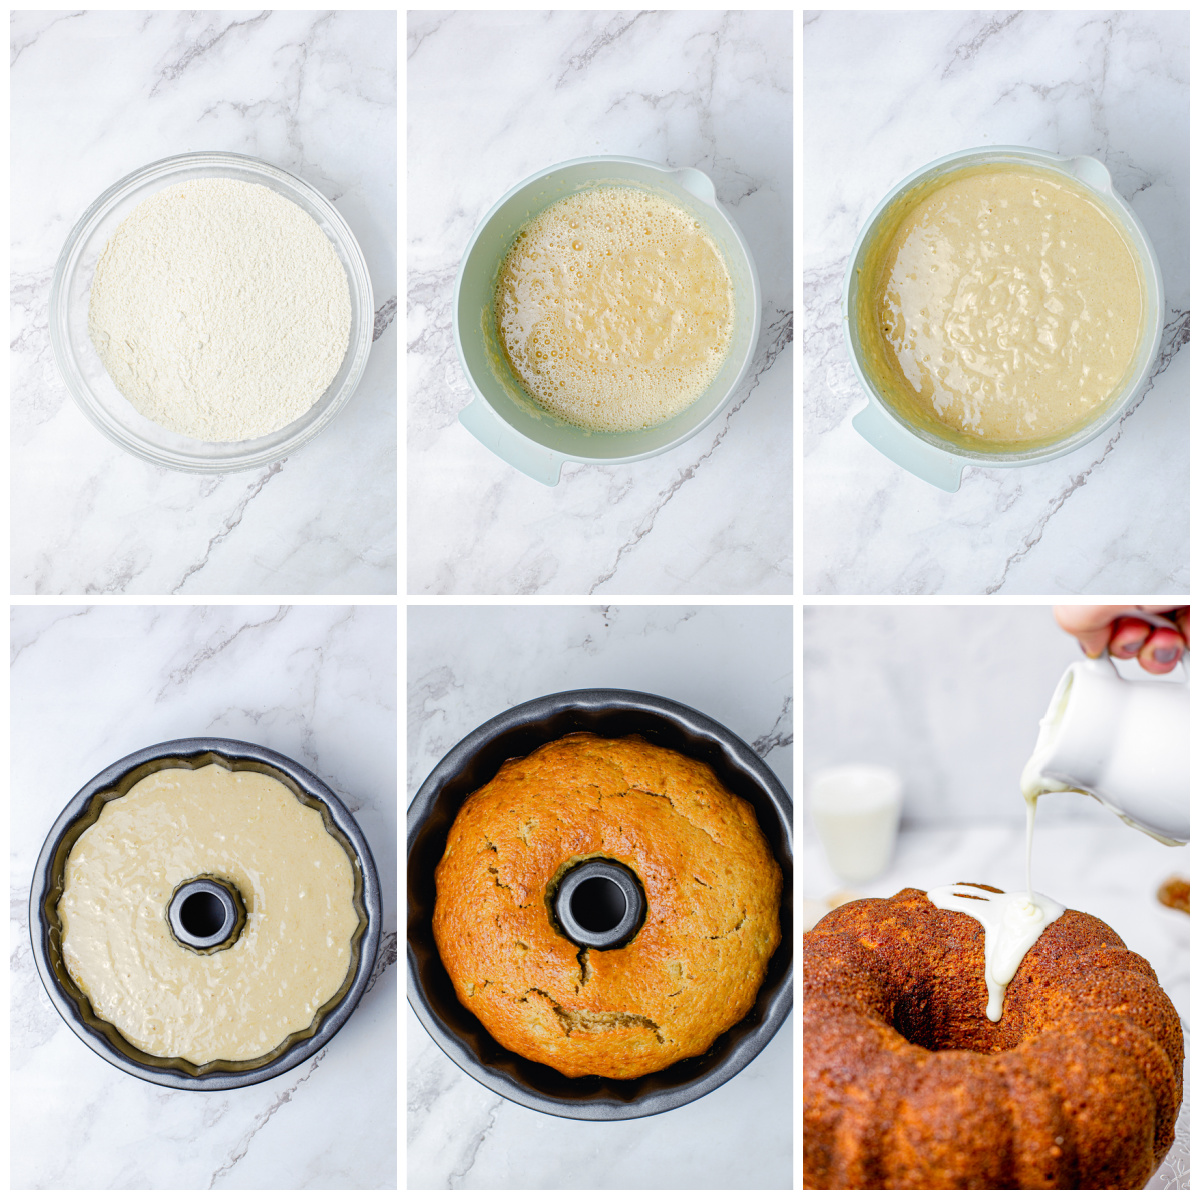 Step by step photos on how to make a Hummingbird Bundt Cake